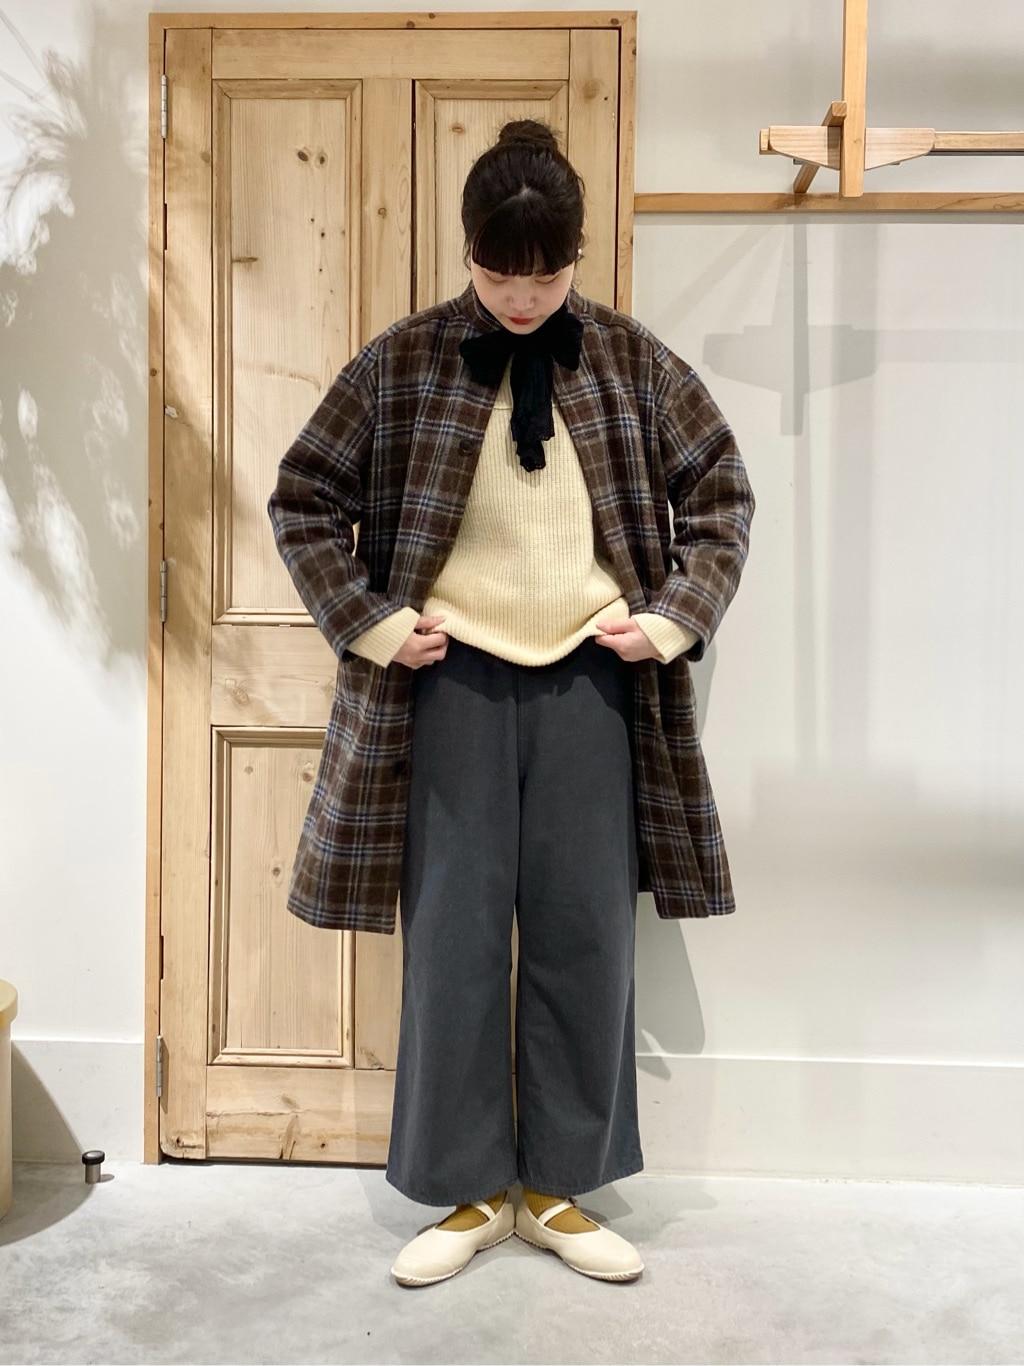 Malle chambre de charme 調布パルコ 身長:167cm 2020.10.26